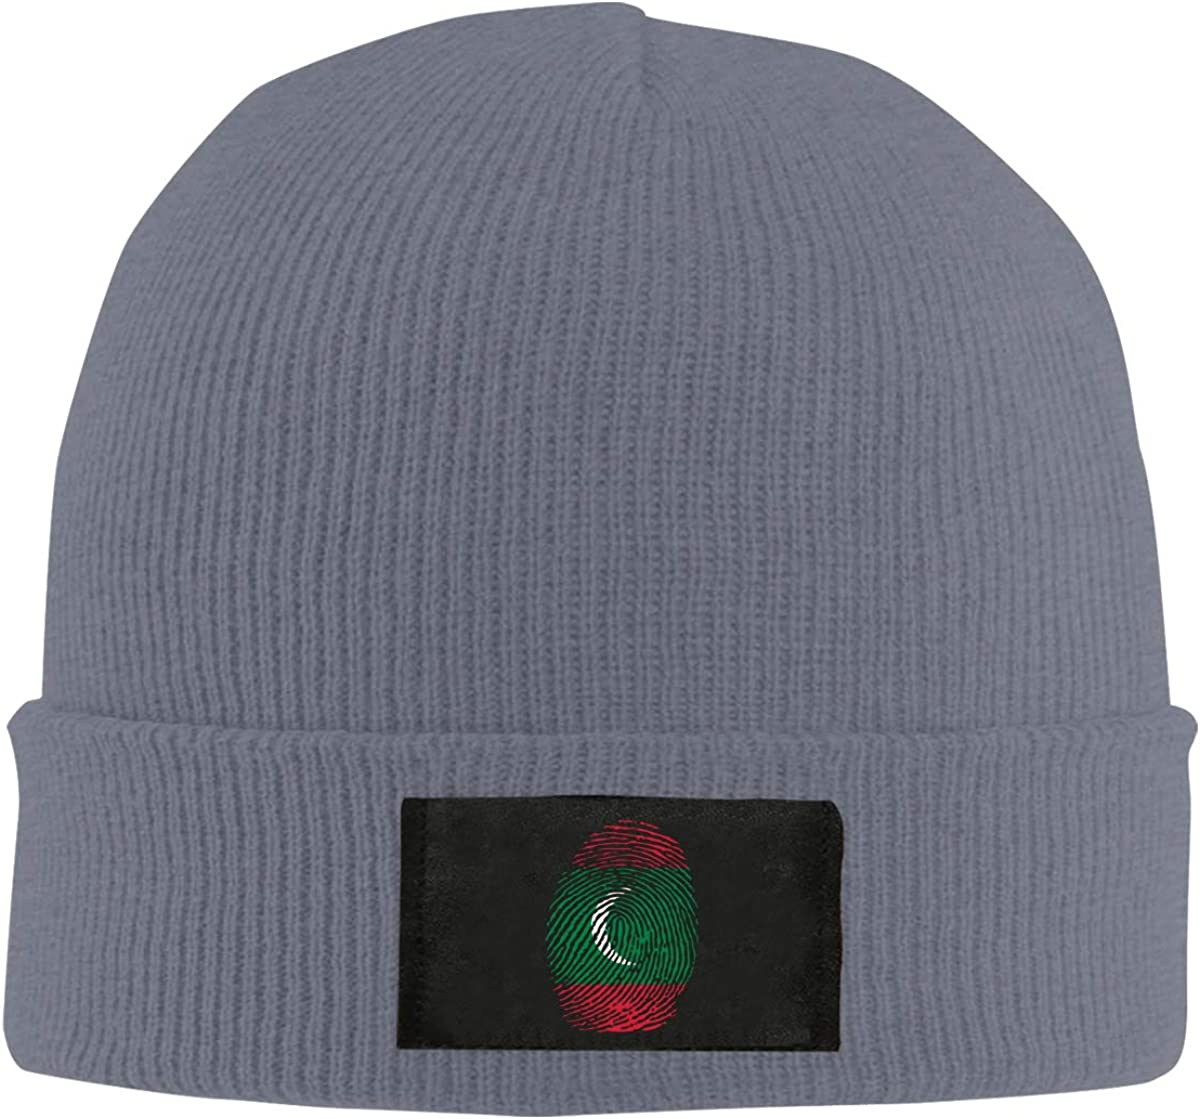 Unisex Stylish Slouch Beanie Hats Black Maldives Top Level Beanie Men Women